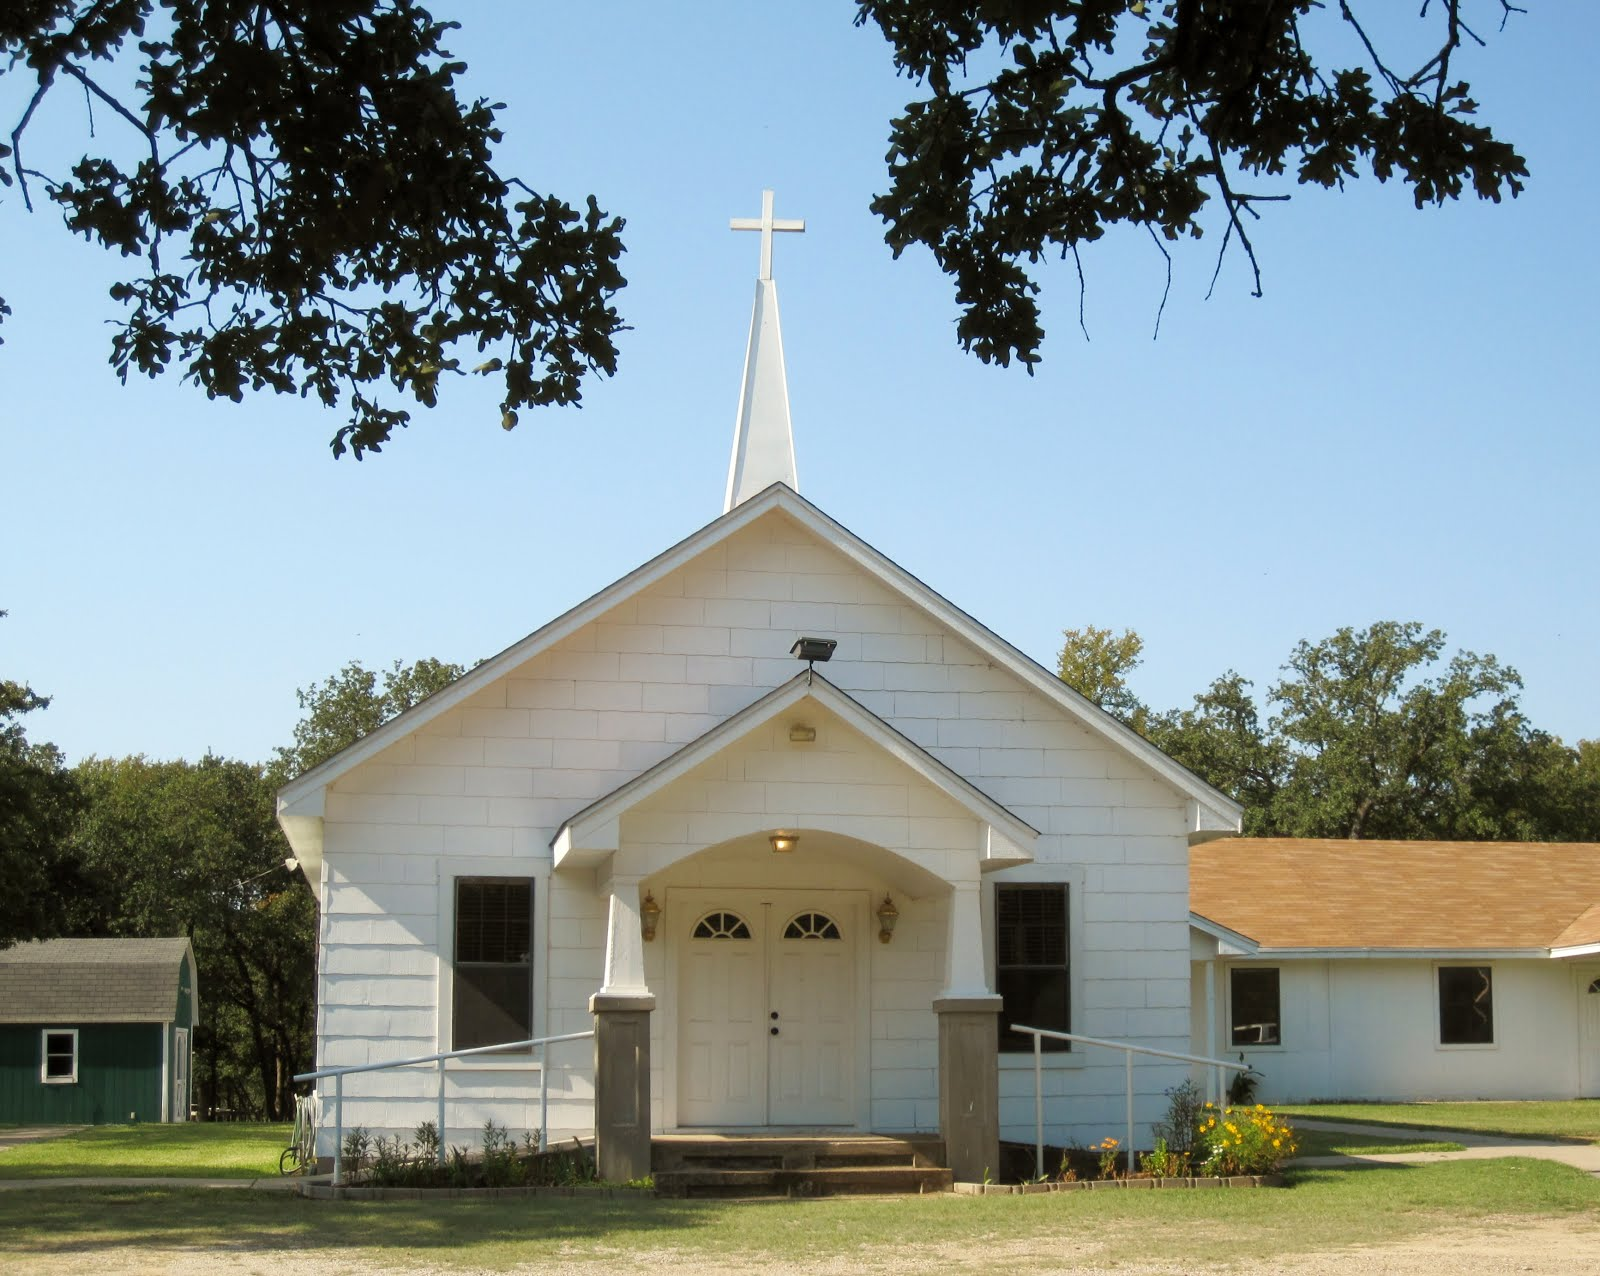 WAPLES UNITED METHODIST CHURCH